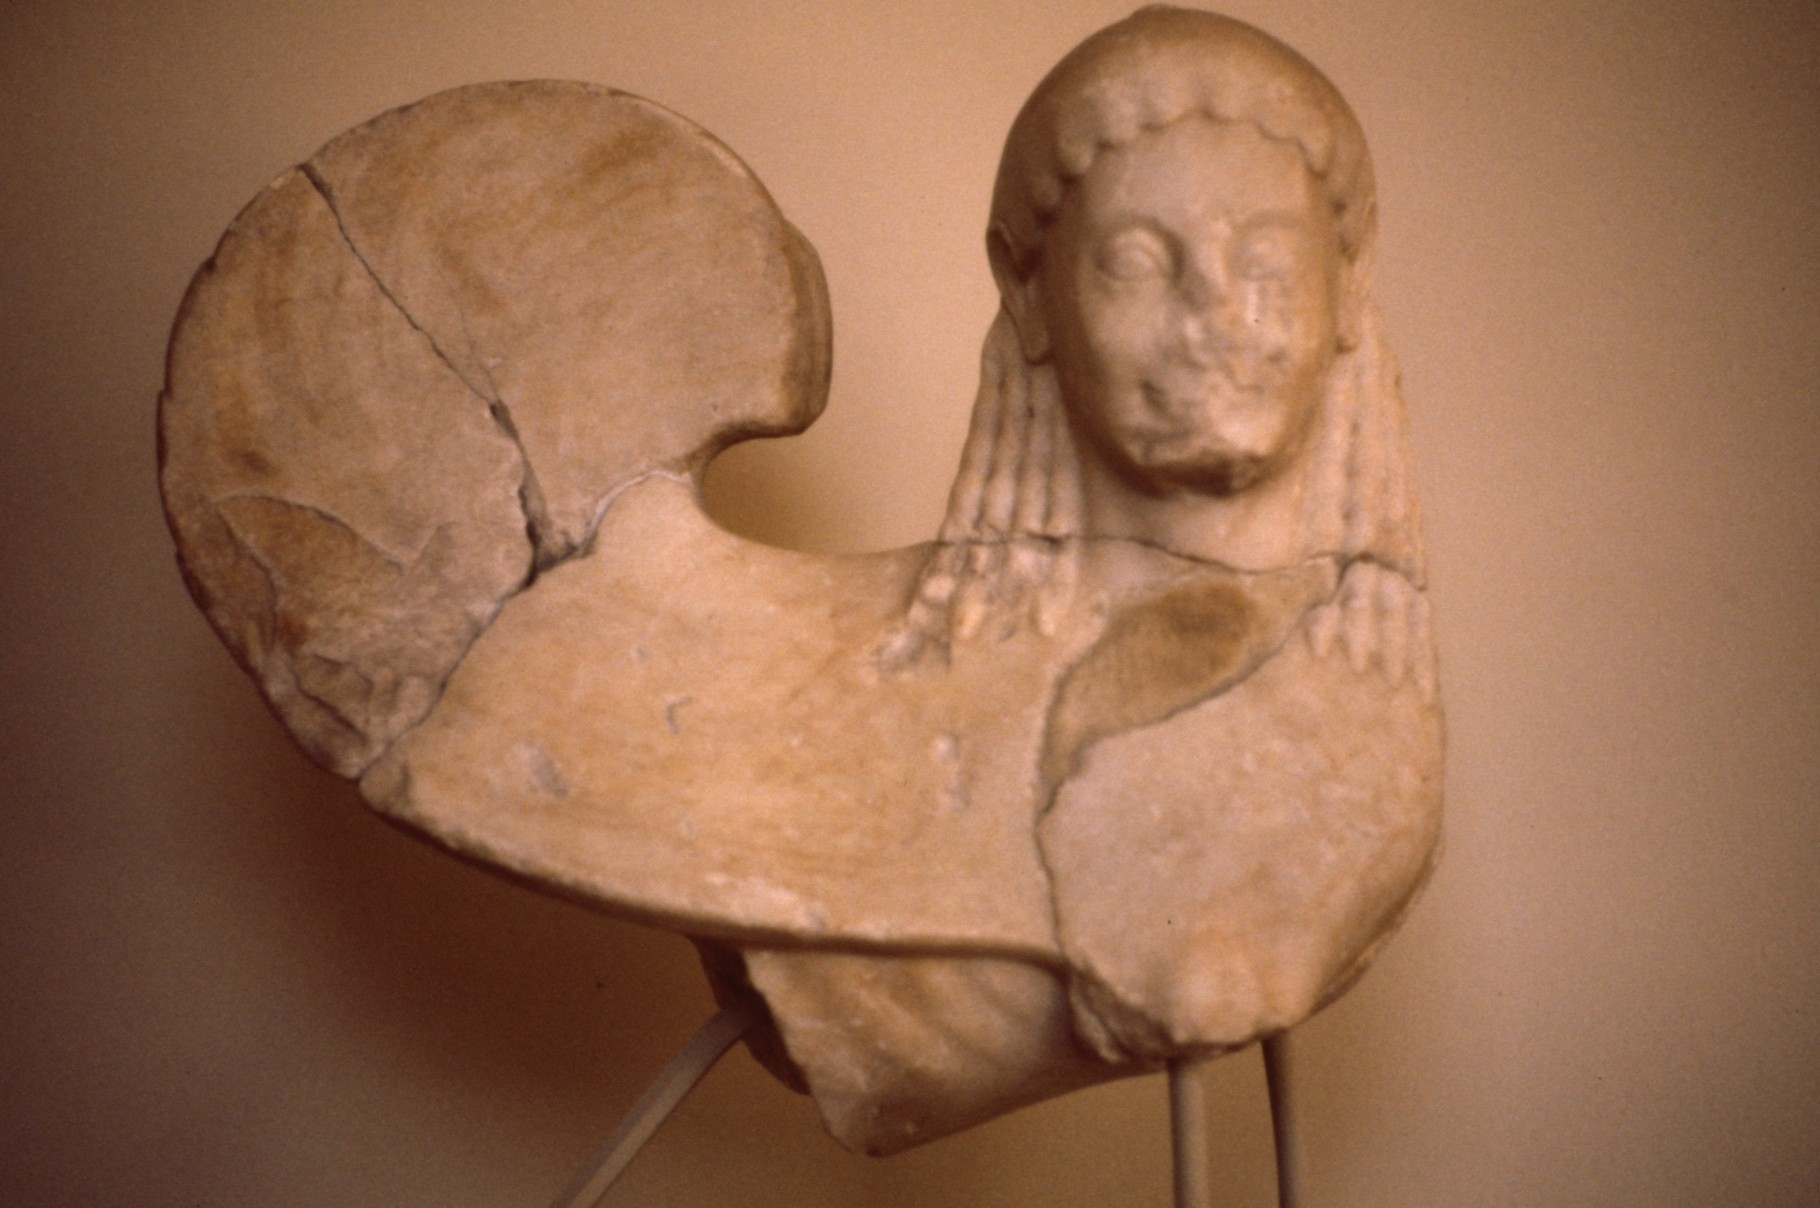 560B.C.ころの墓碑 アテネ